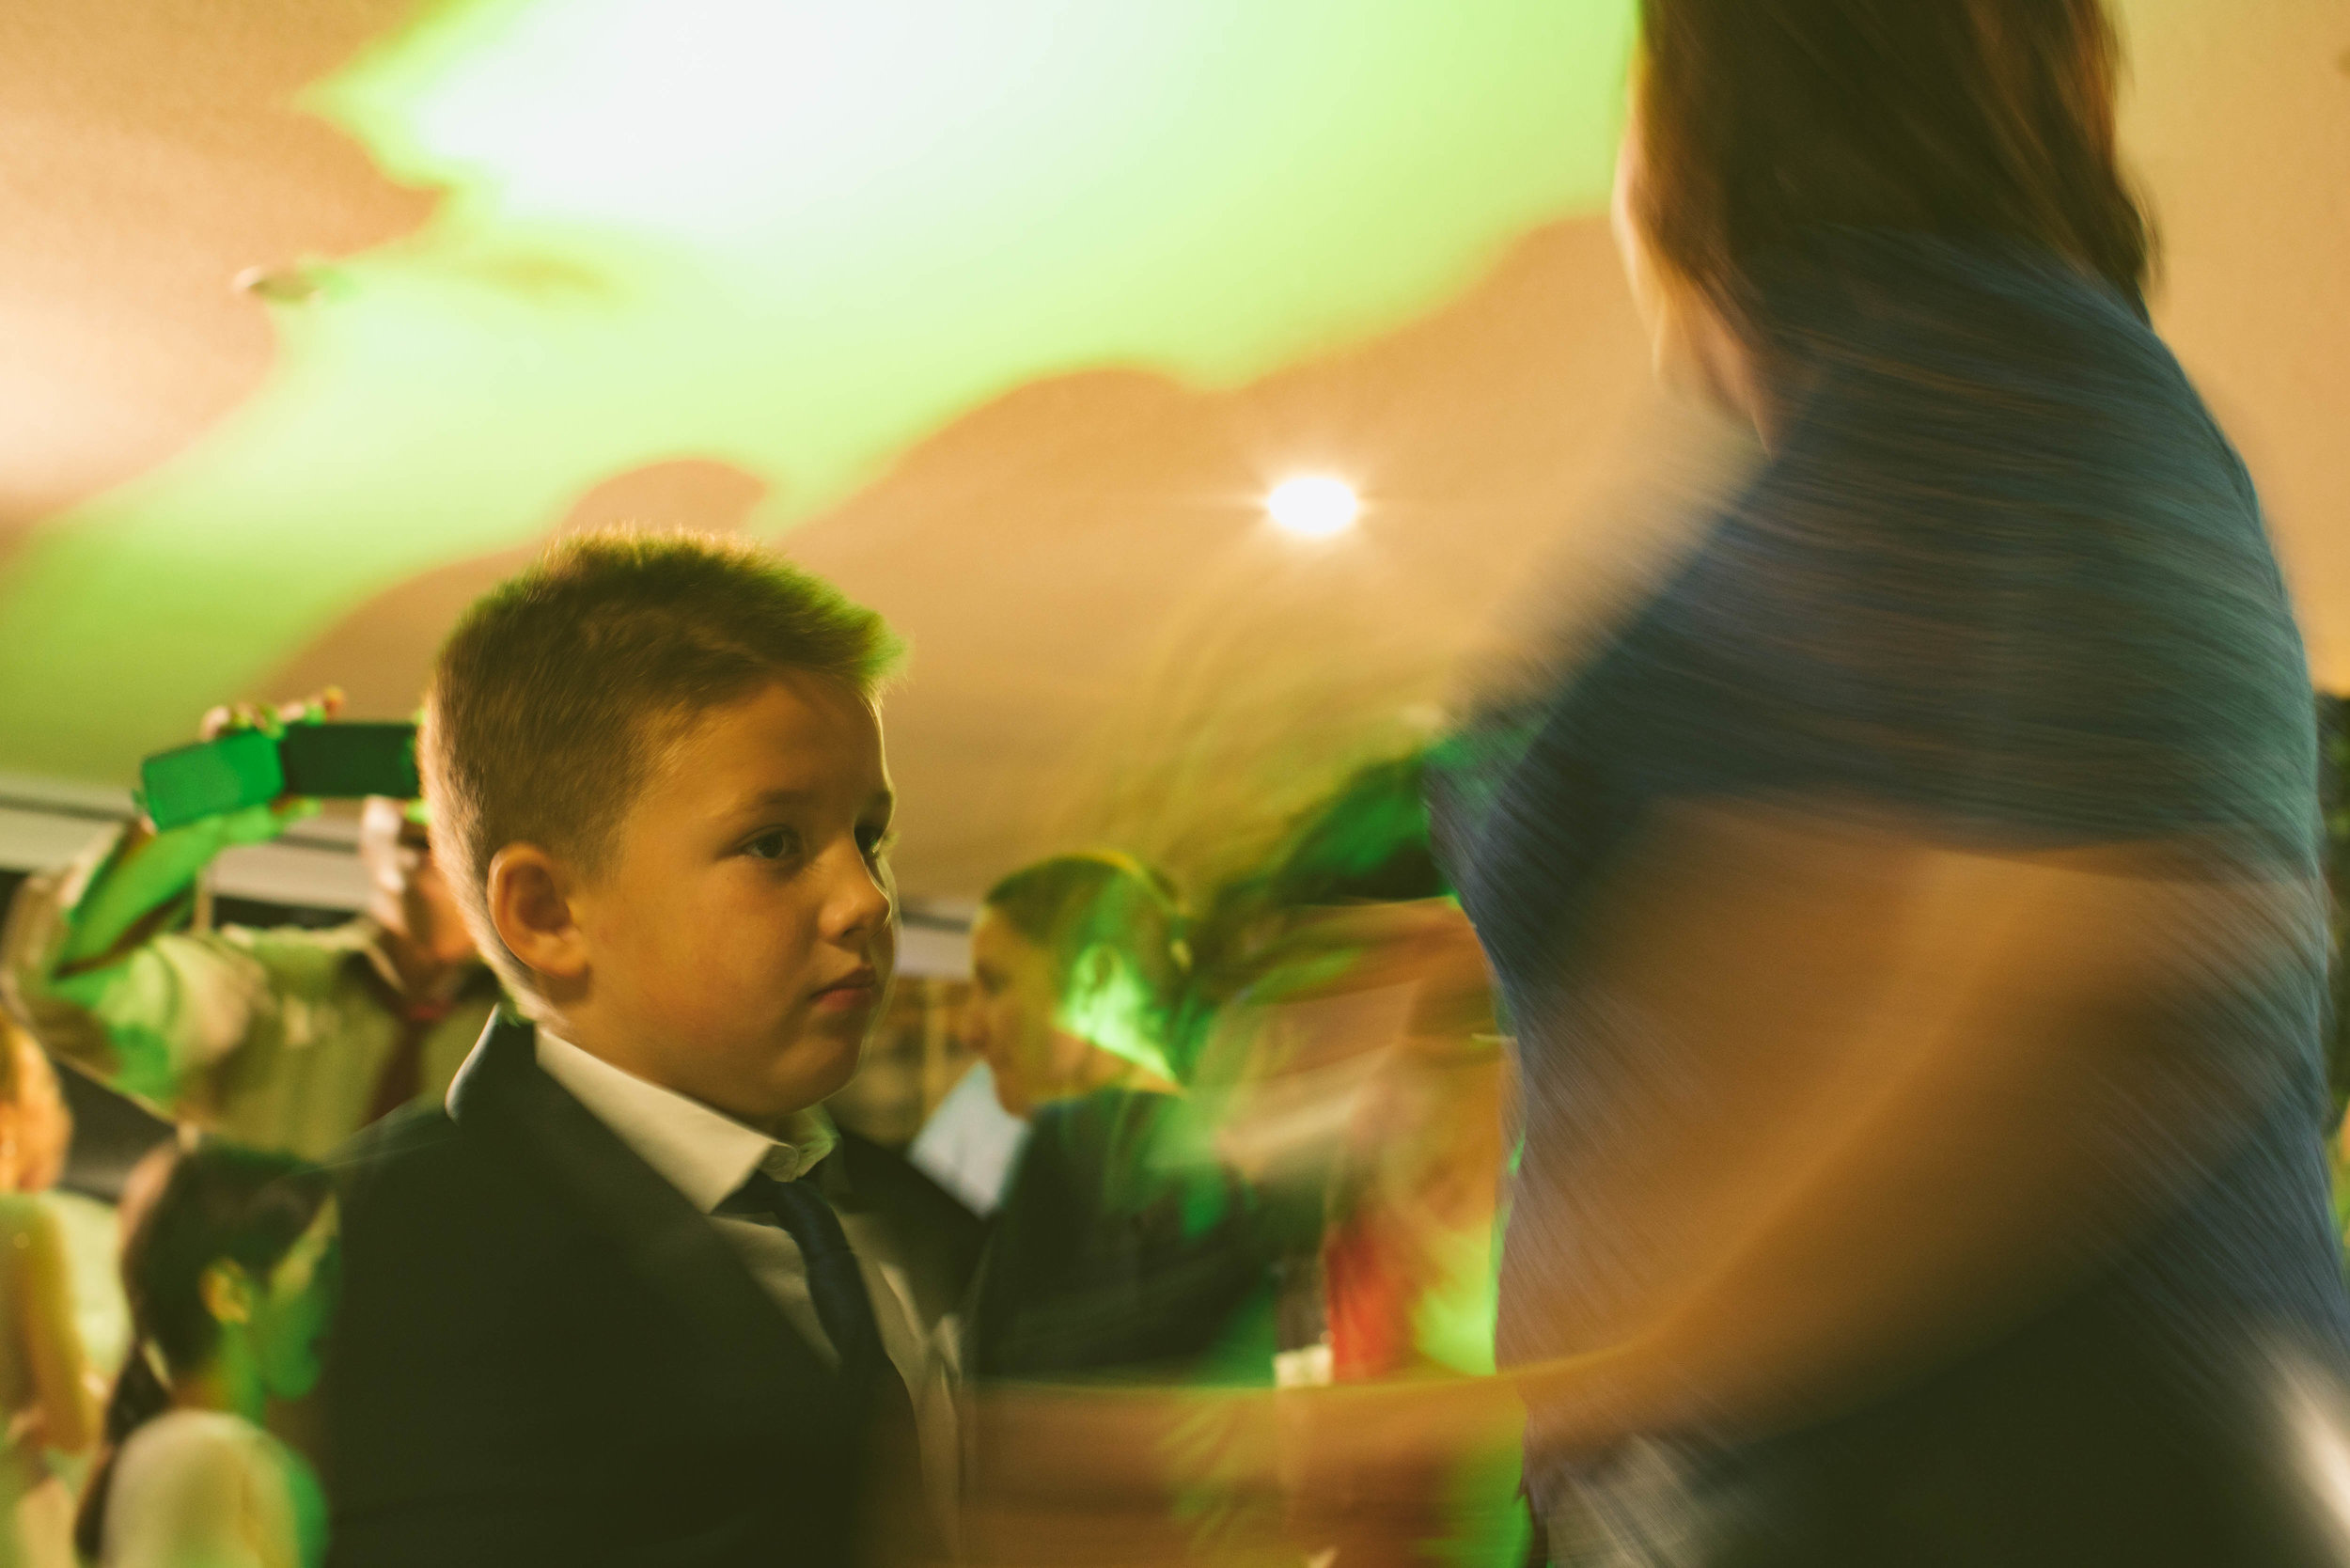 Dance the night away✨